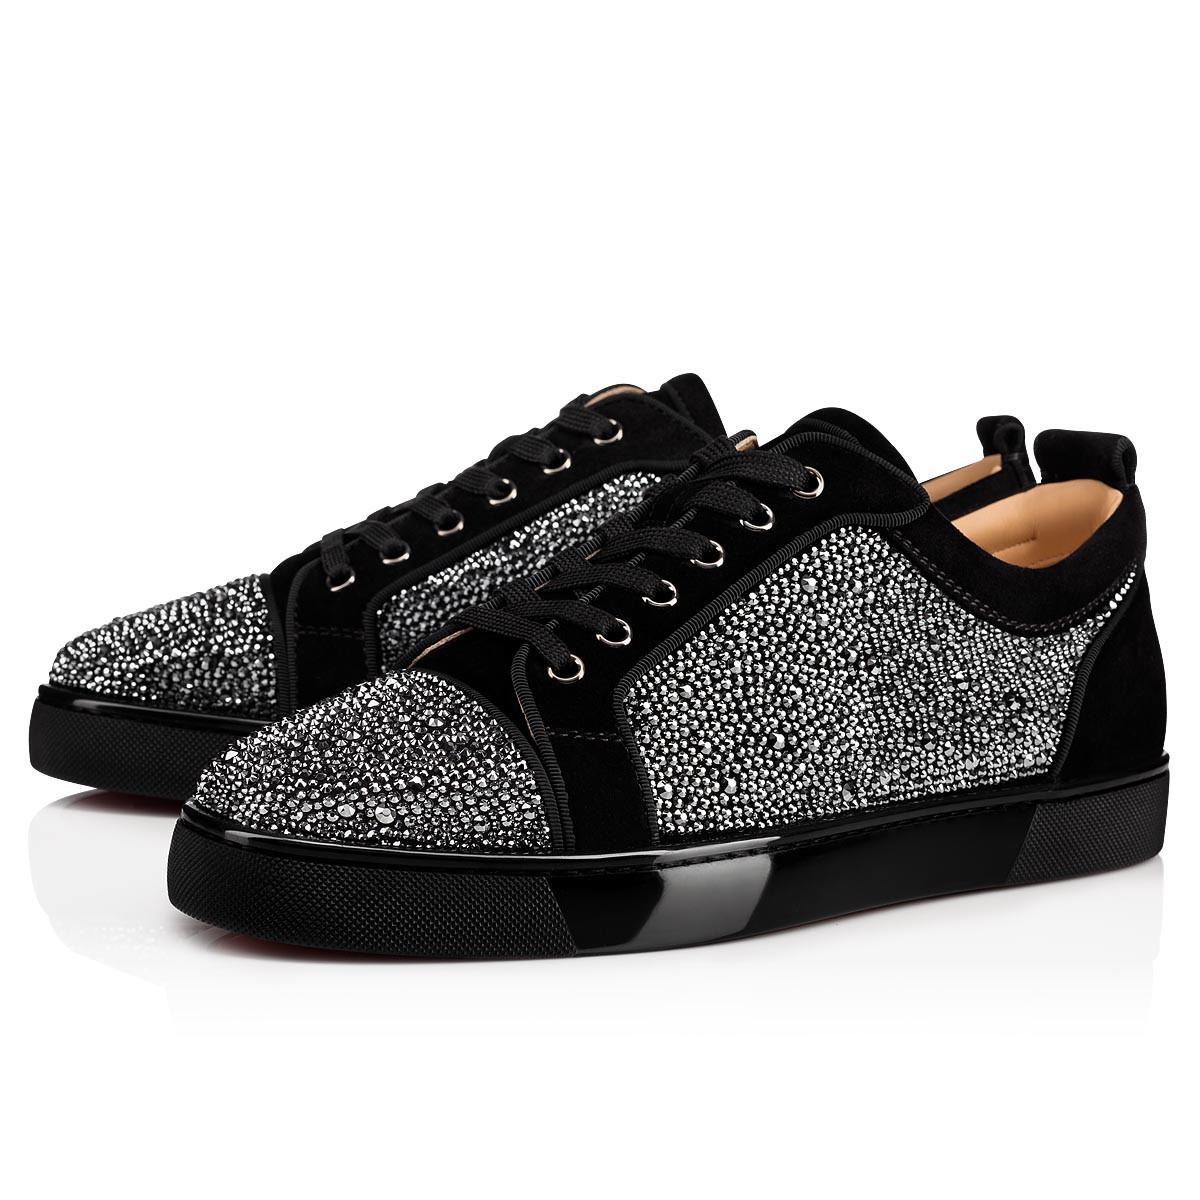 Strass - Men Shoes - Christian Louboutin